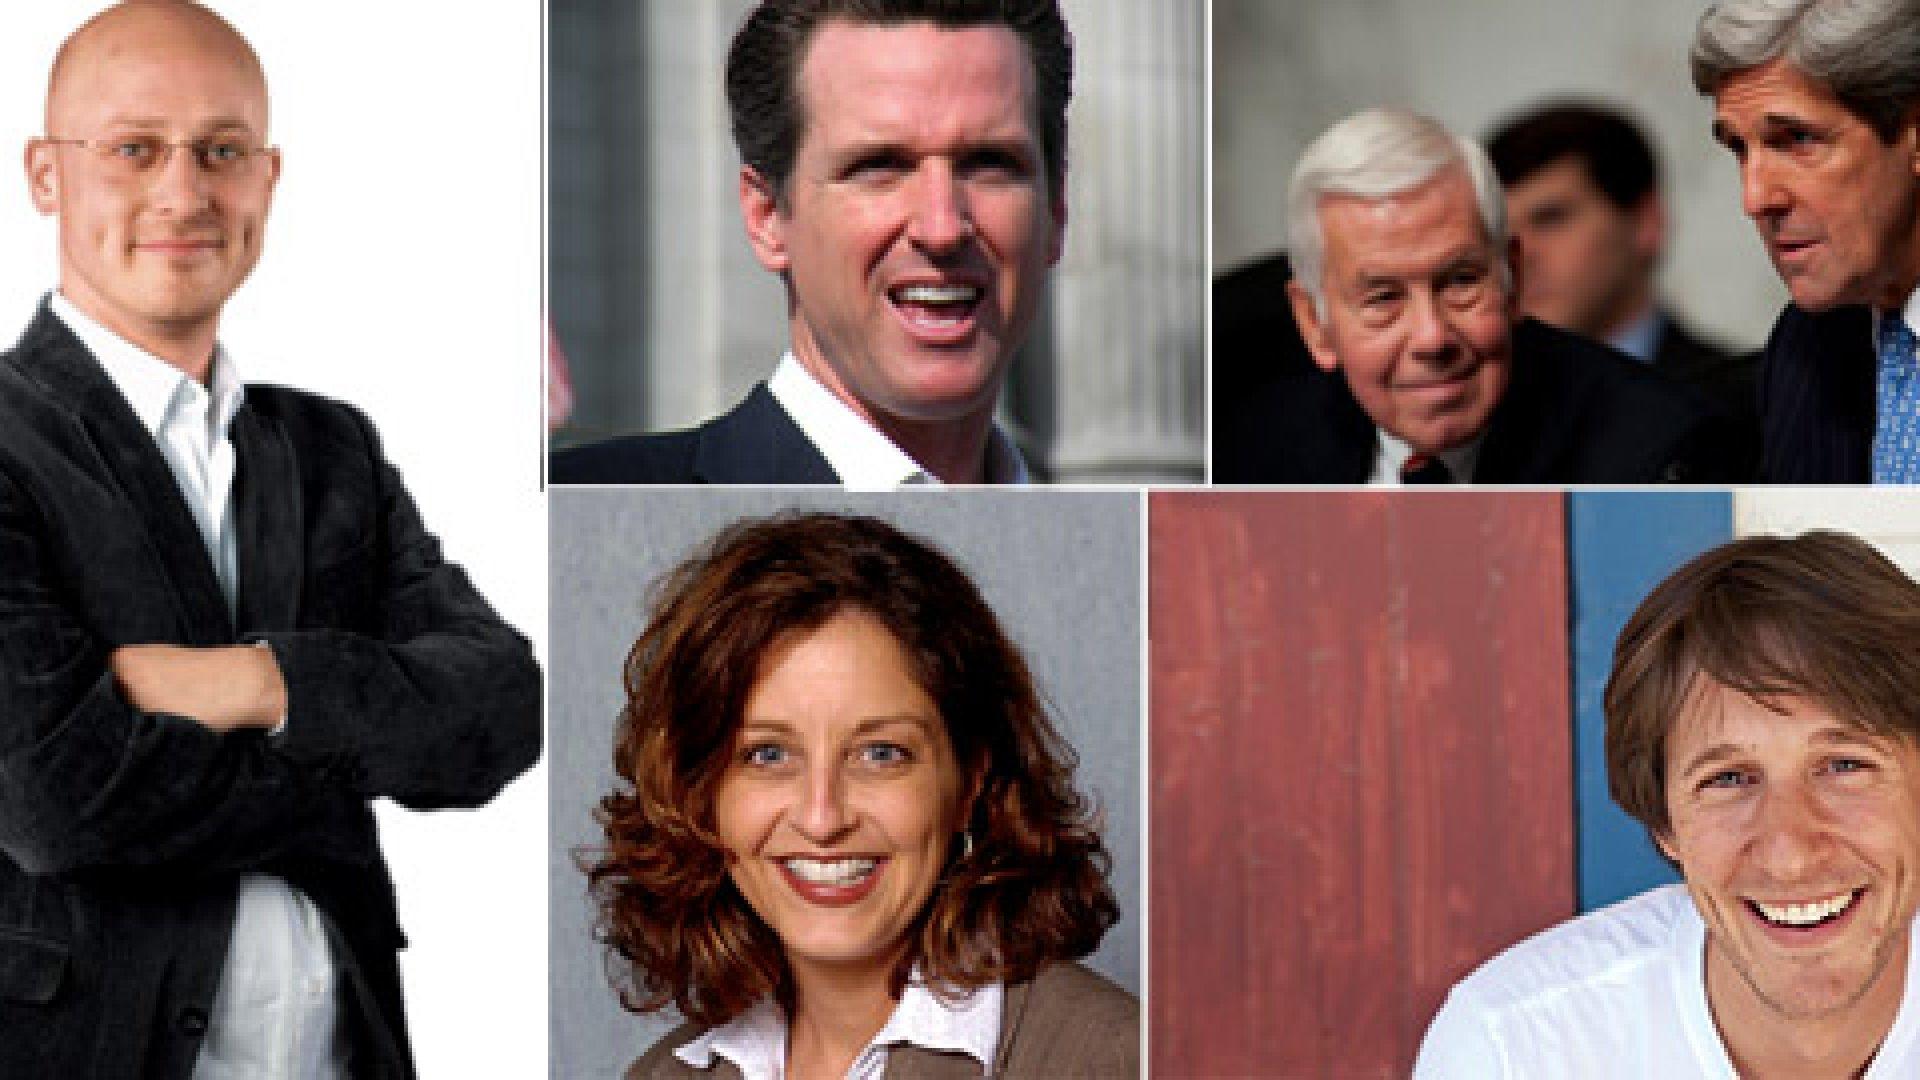 <strong>Clockwise from left</strong> Joshua Baer, Gavin Newsom, Richard Lugar, John Kerry, Caleb Zigas, Lisa Patt-McDaniel